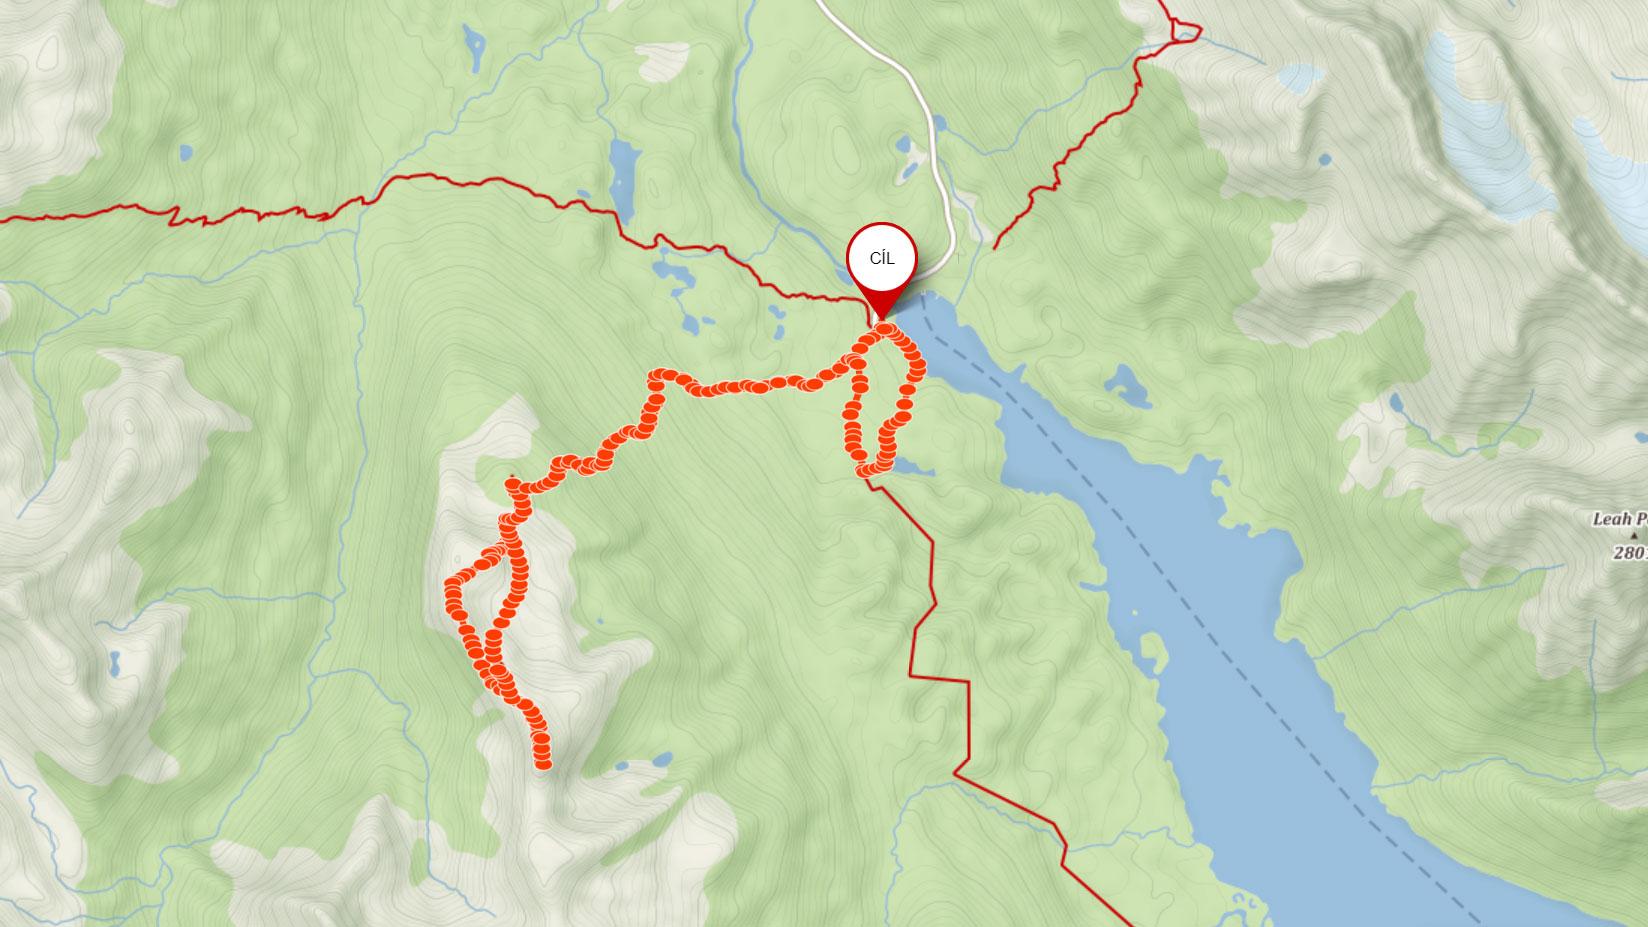 Popisovaná trasa na Bald Hills nad Maligne Lake